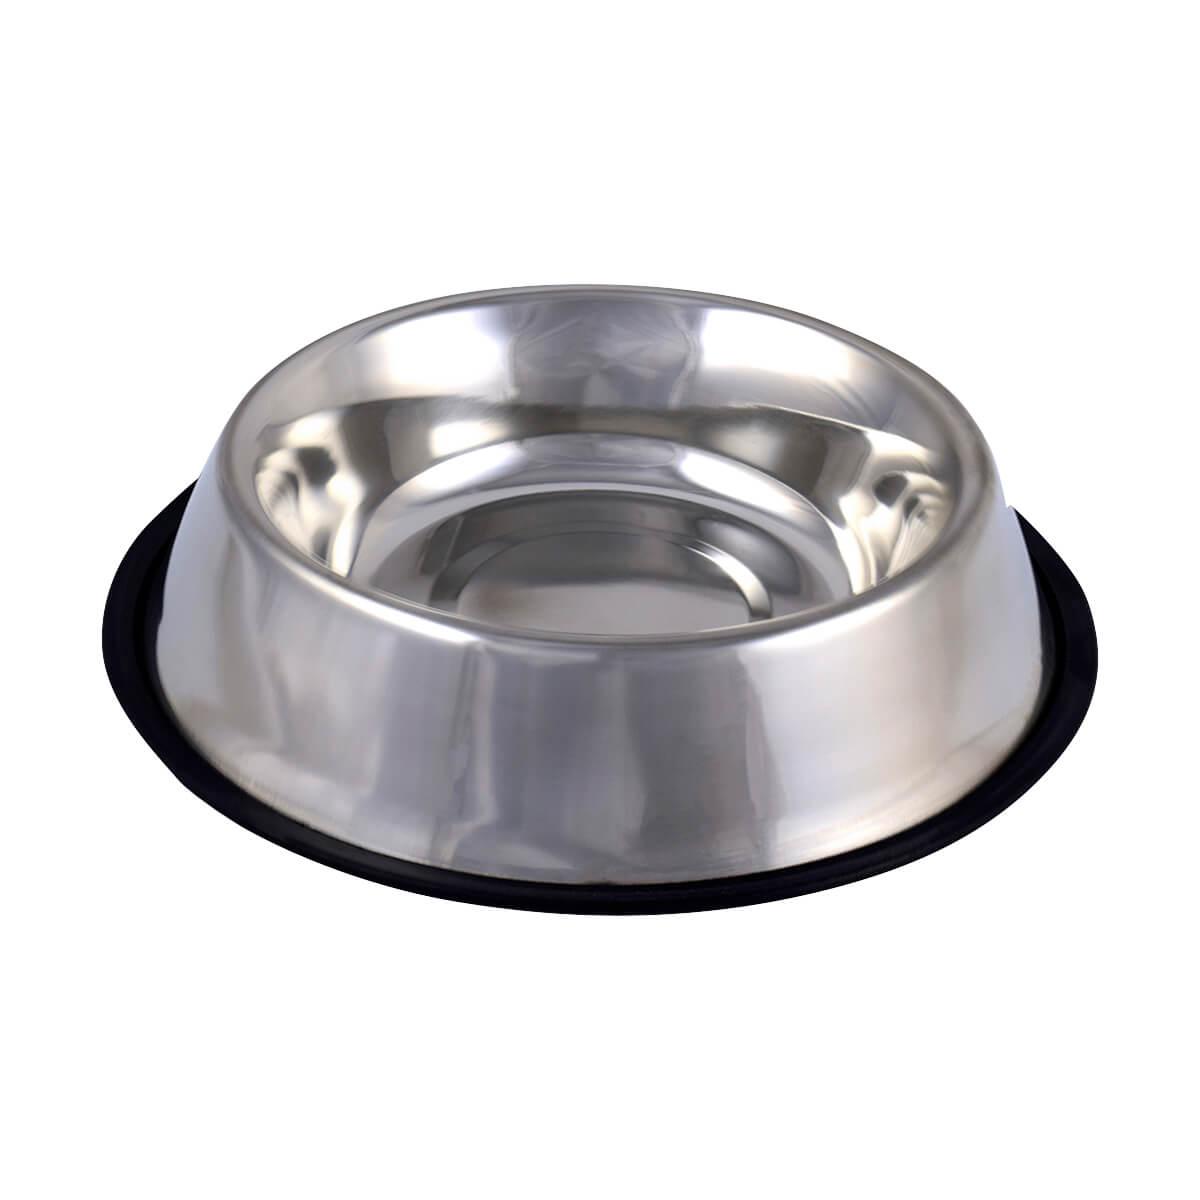 Stainless Steel Bowl - Non-Skid - 64oz